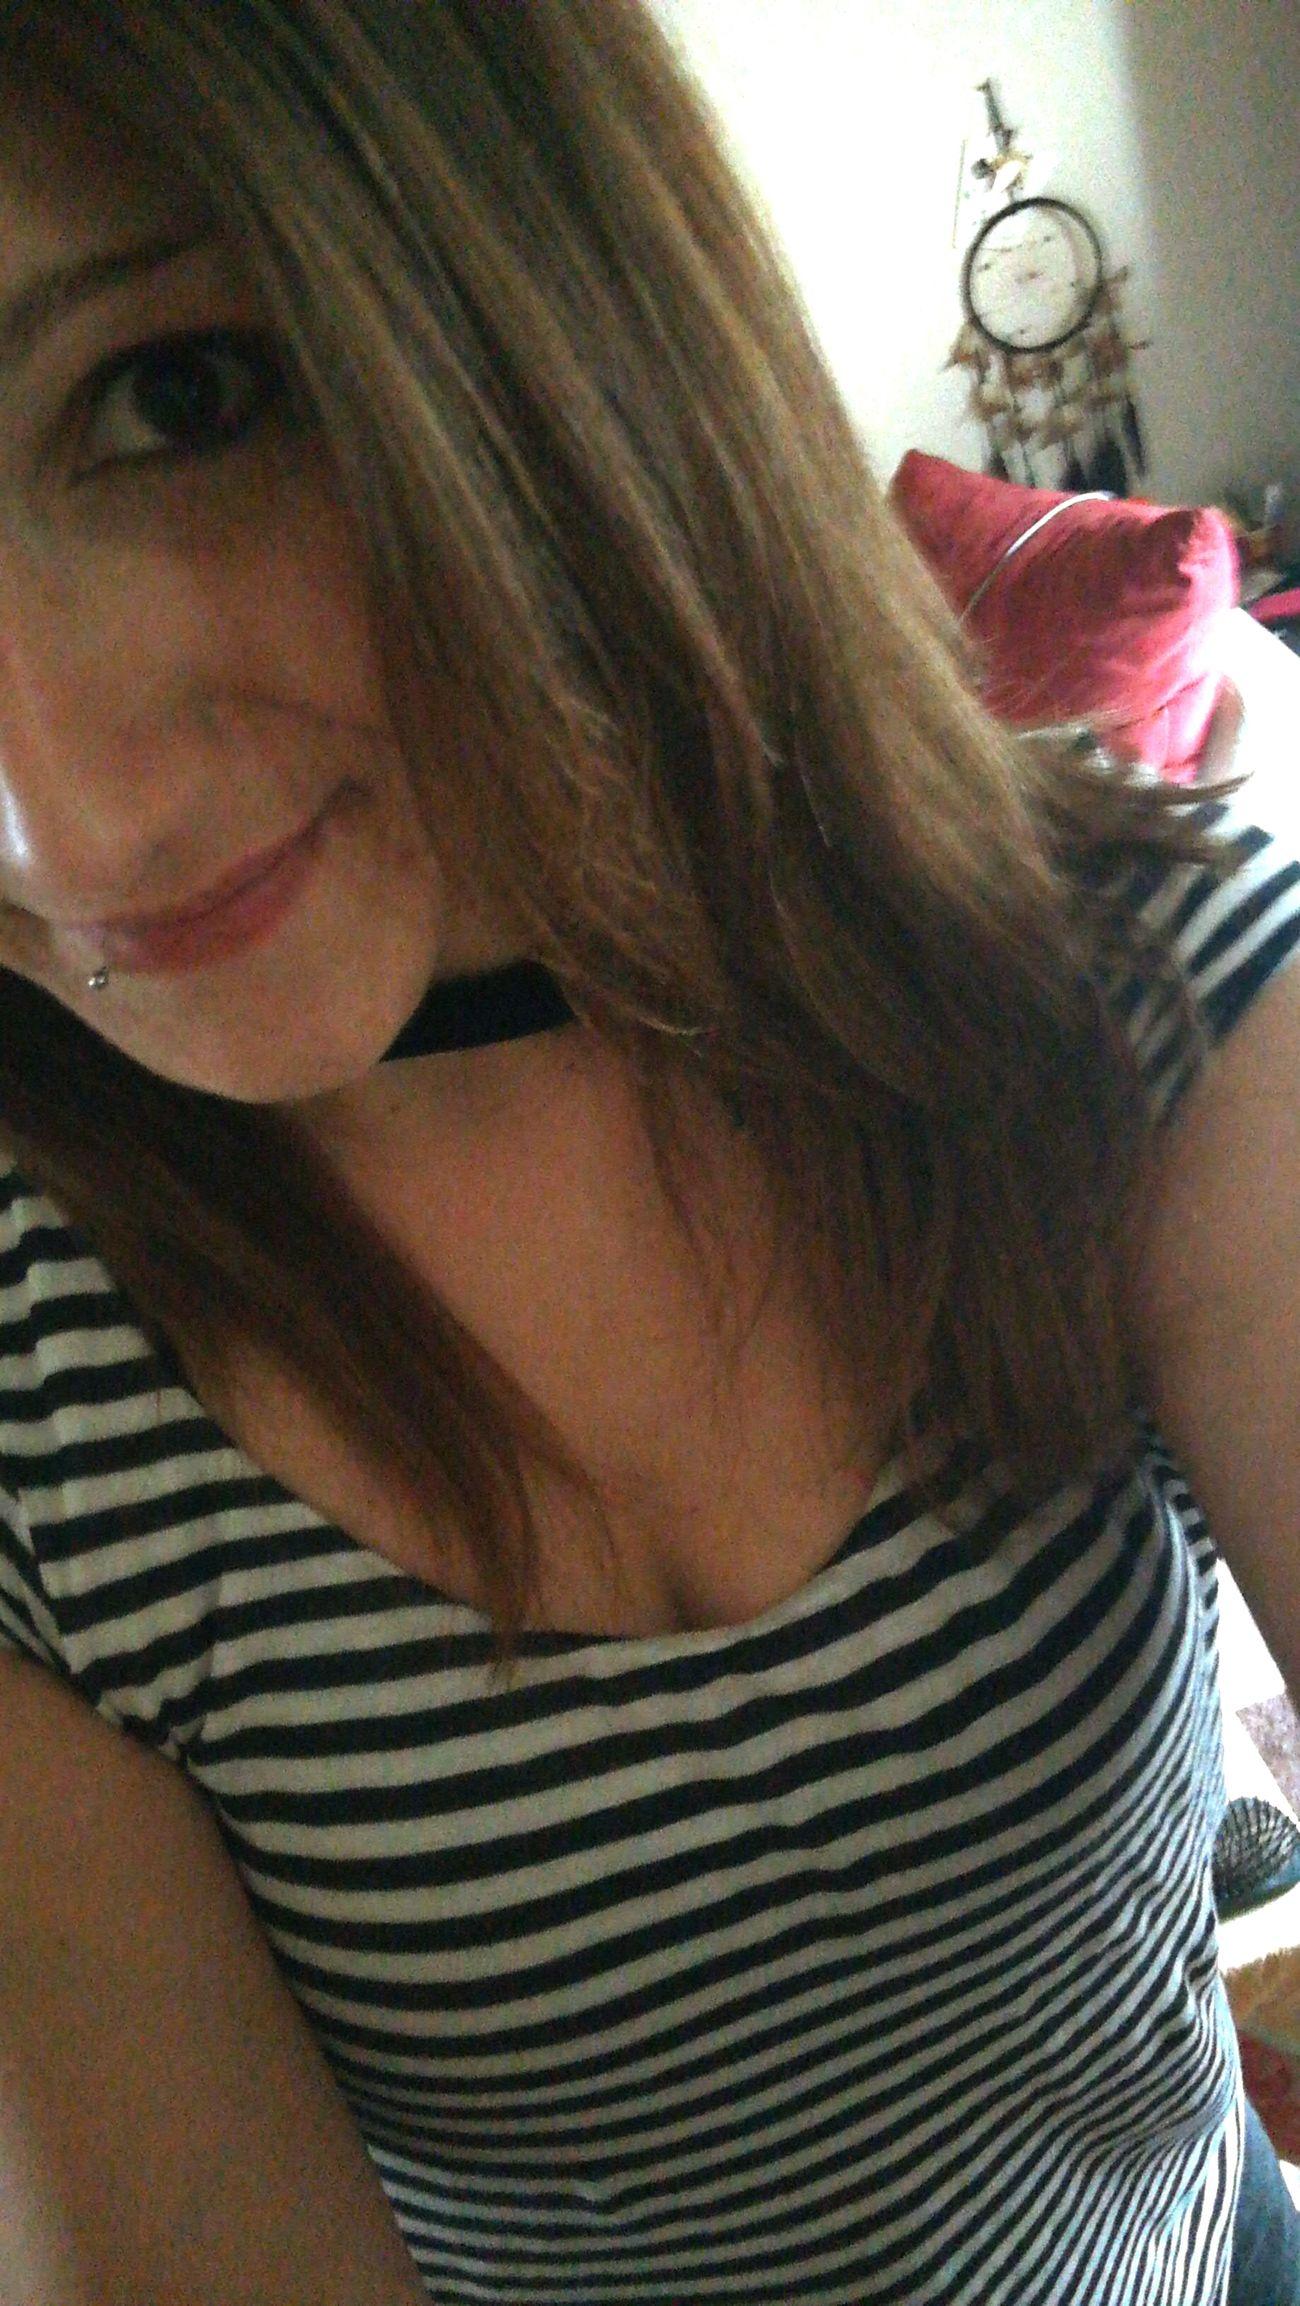 Women One Woman Only Long Hair Keep Smiling Hasiihase Selfie ♥ Mylife♡ Love♥ Brown Eyes Brown Hair MeMyself&I Selfie✌ Smiling Weekend ♥ Brunette Girl  Only Women Young Women Looking At Camera